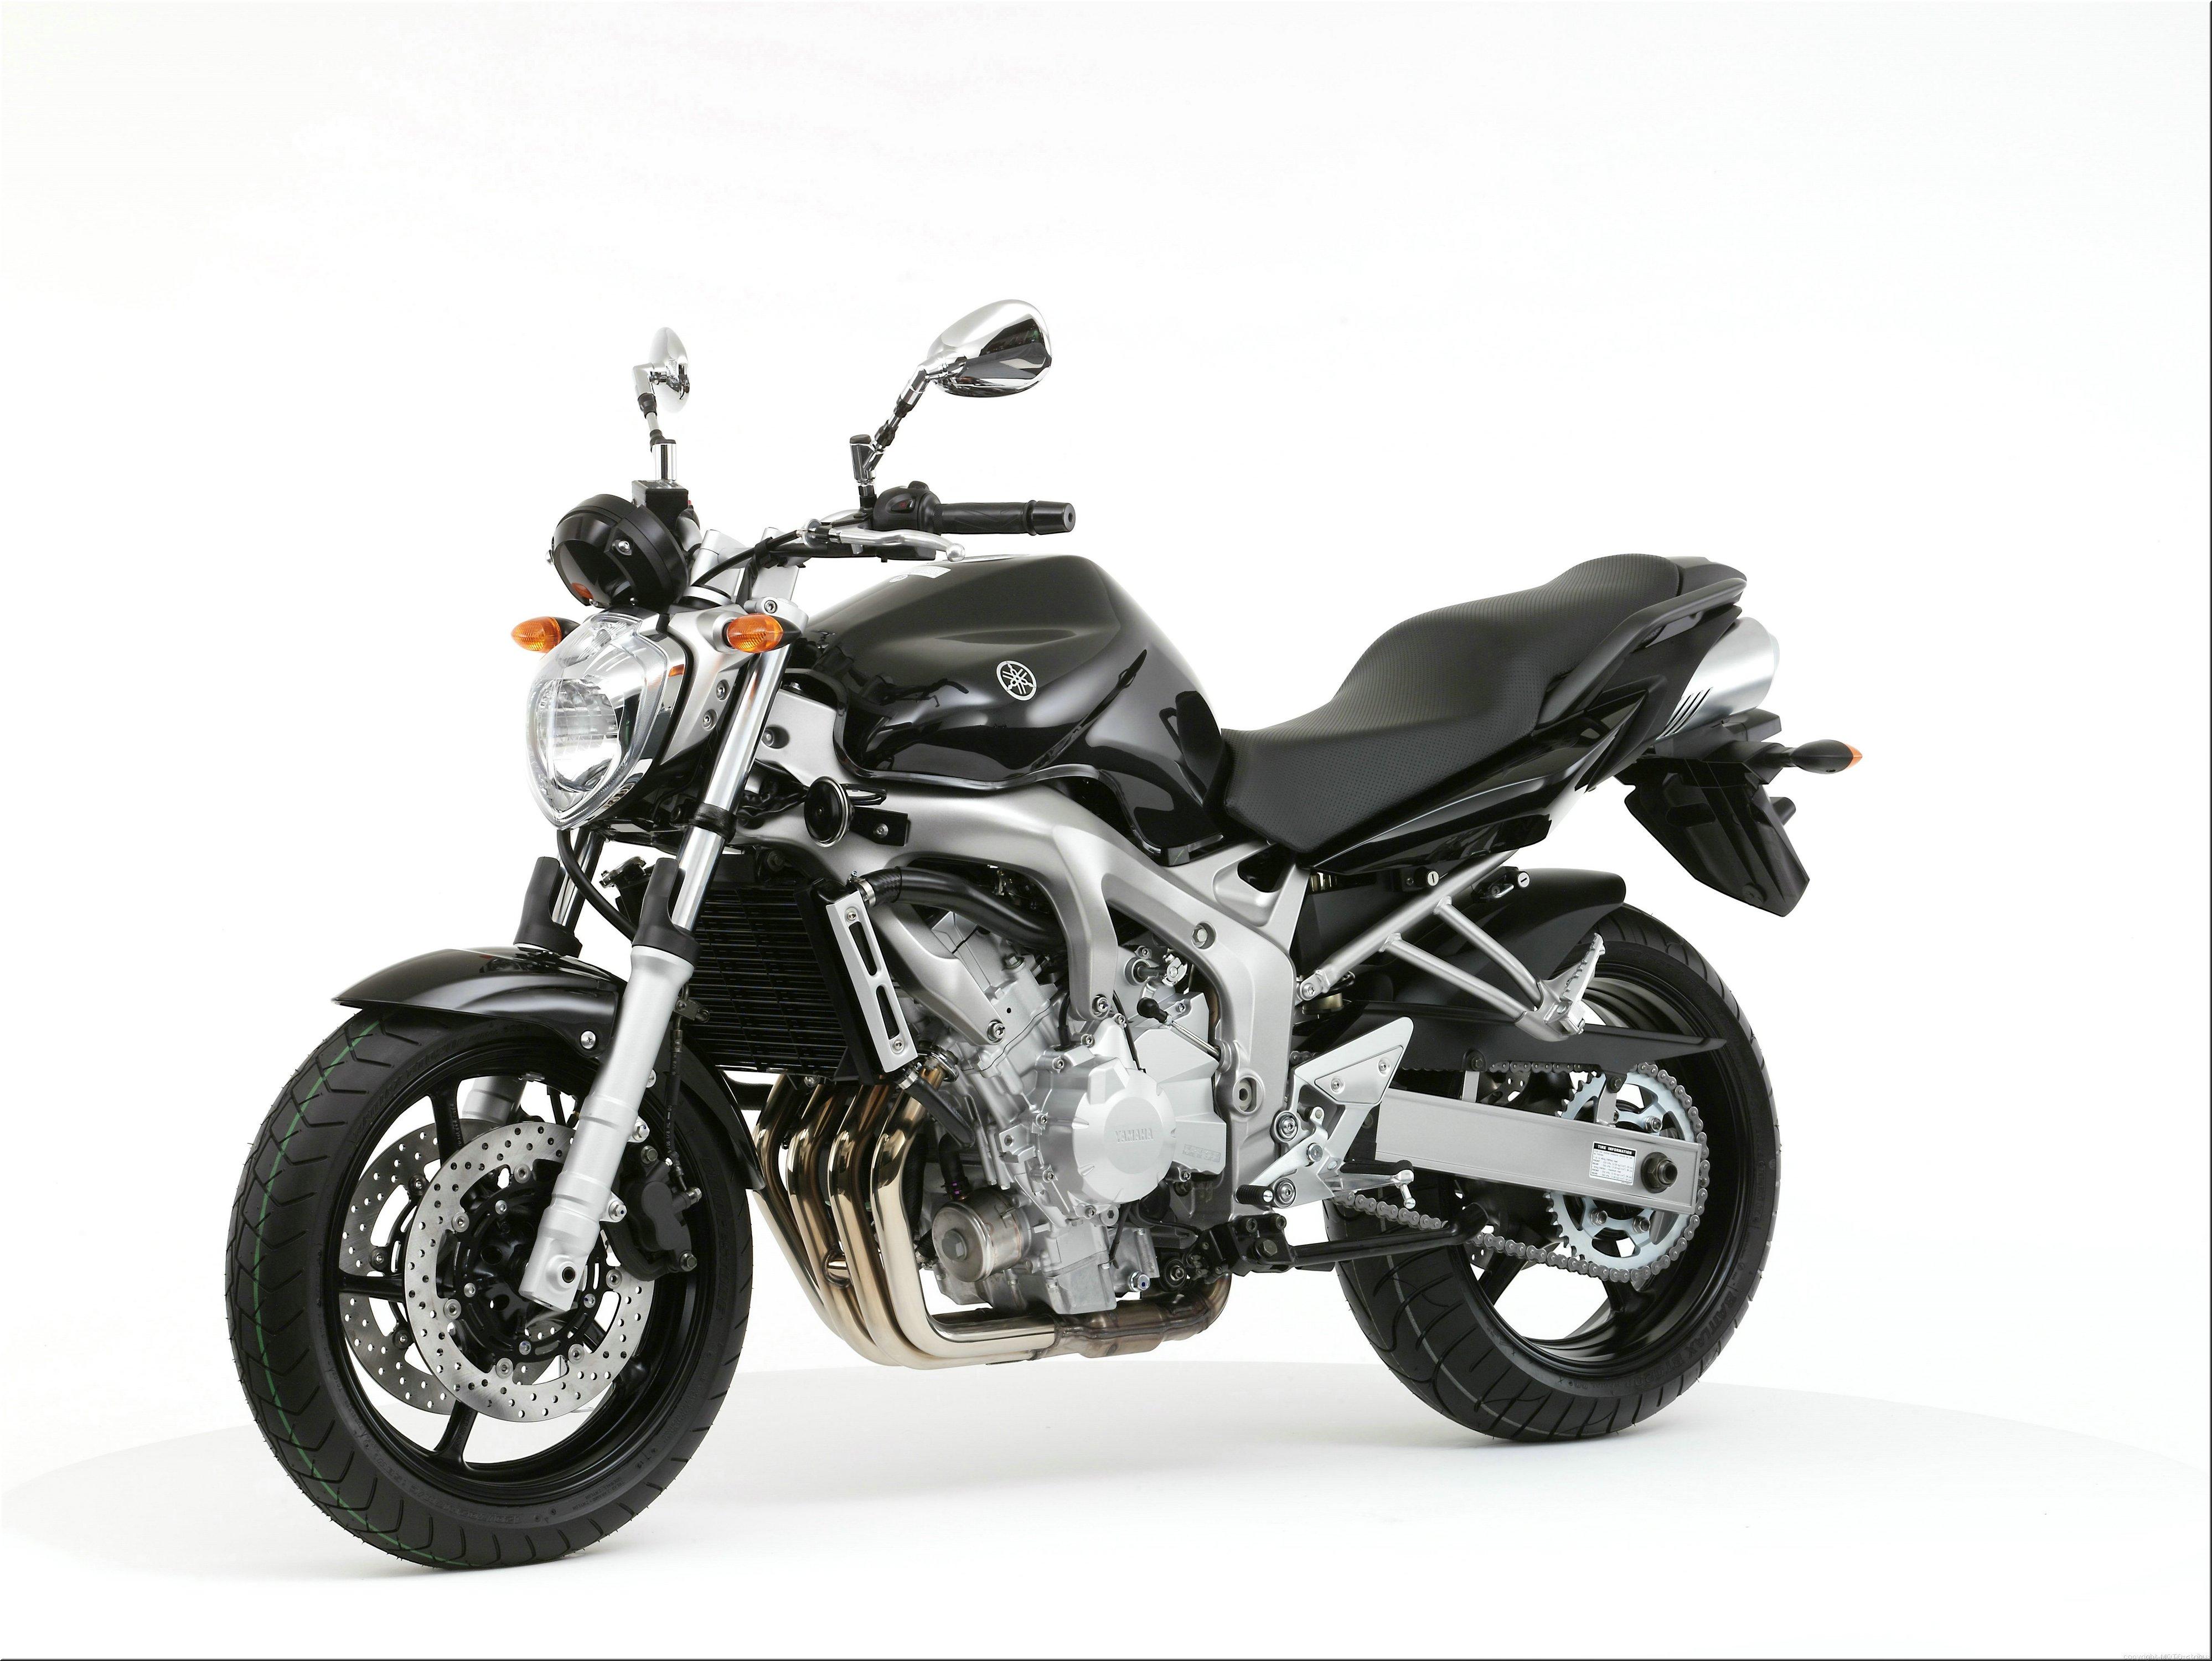 Yamaha FZ6 (FZ6N, FZ6S, FZ6R)